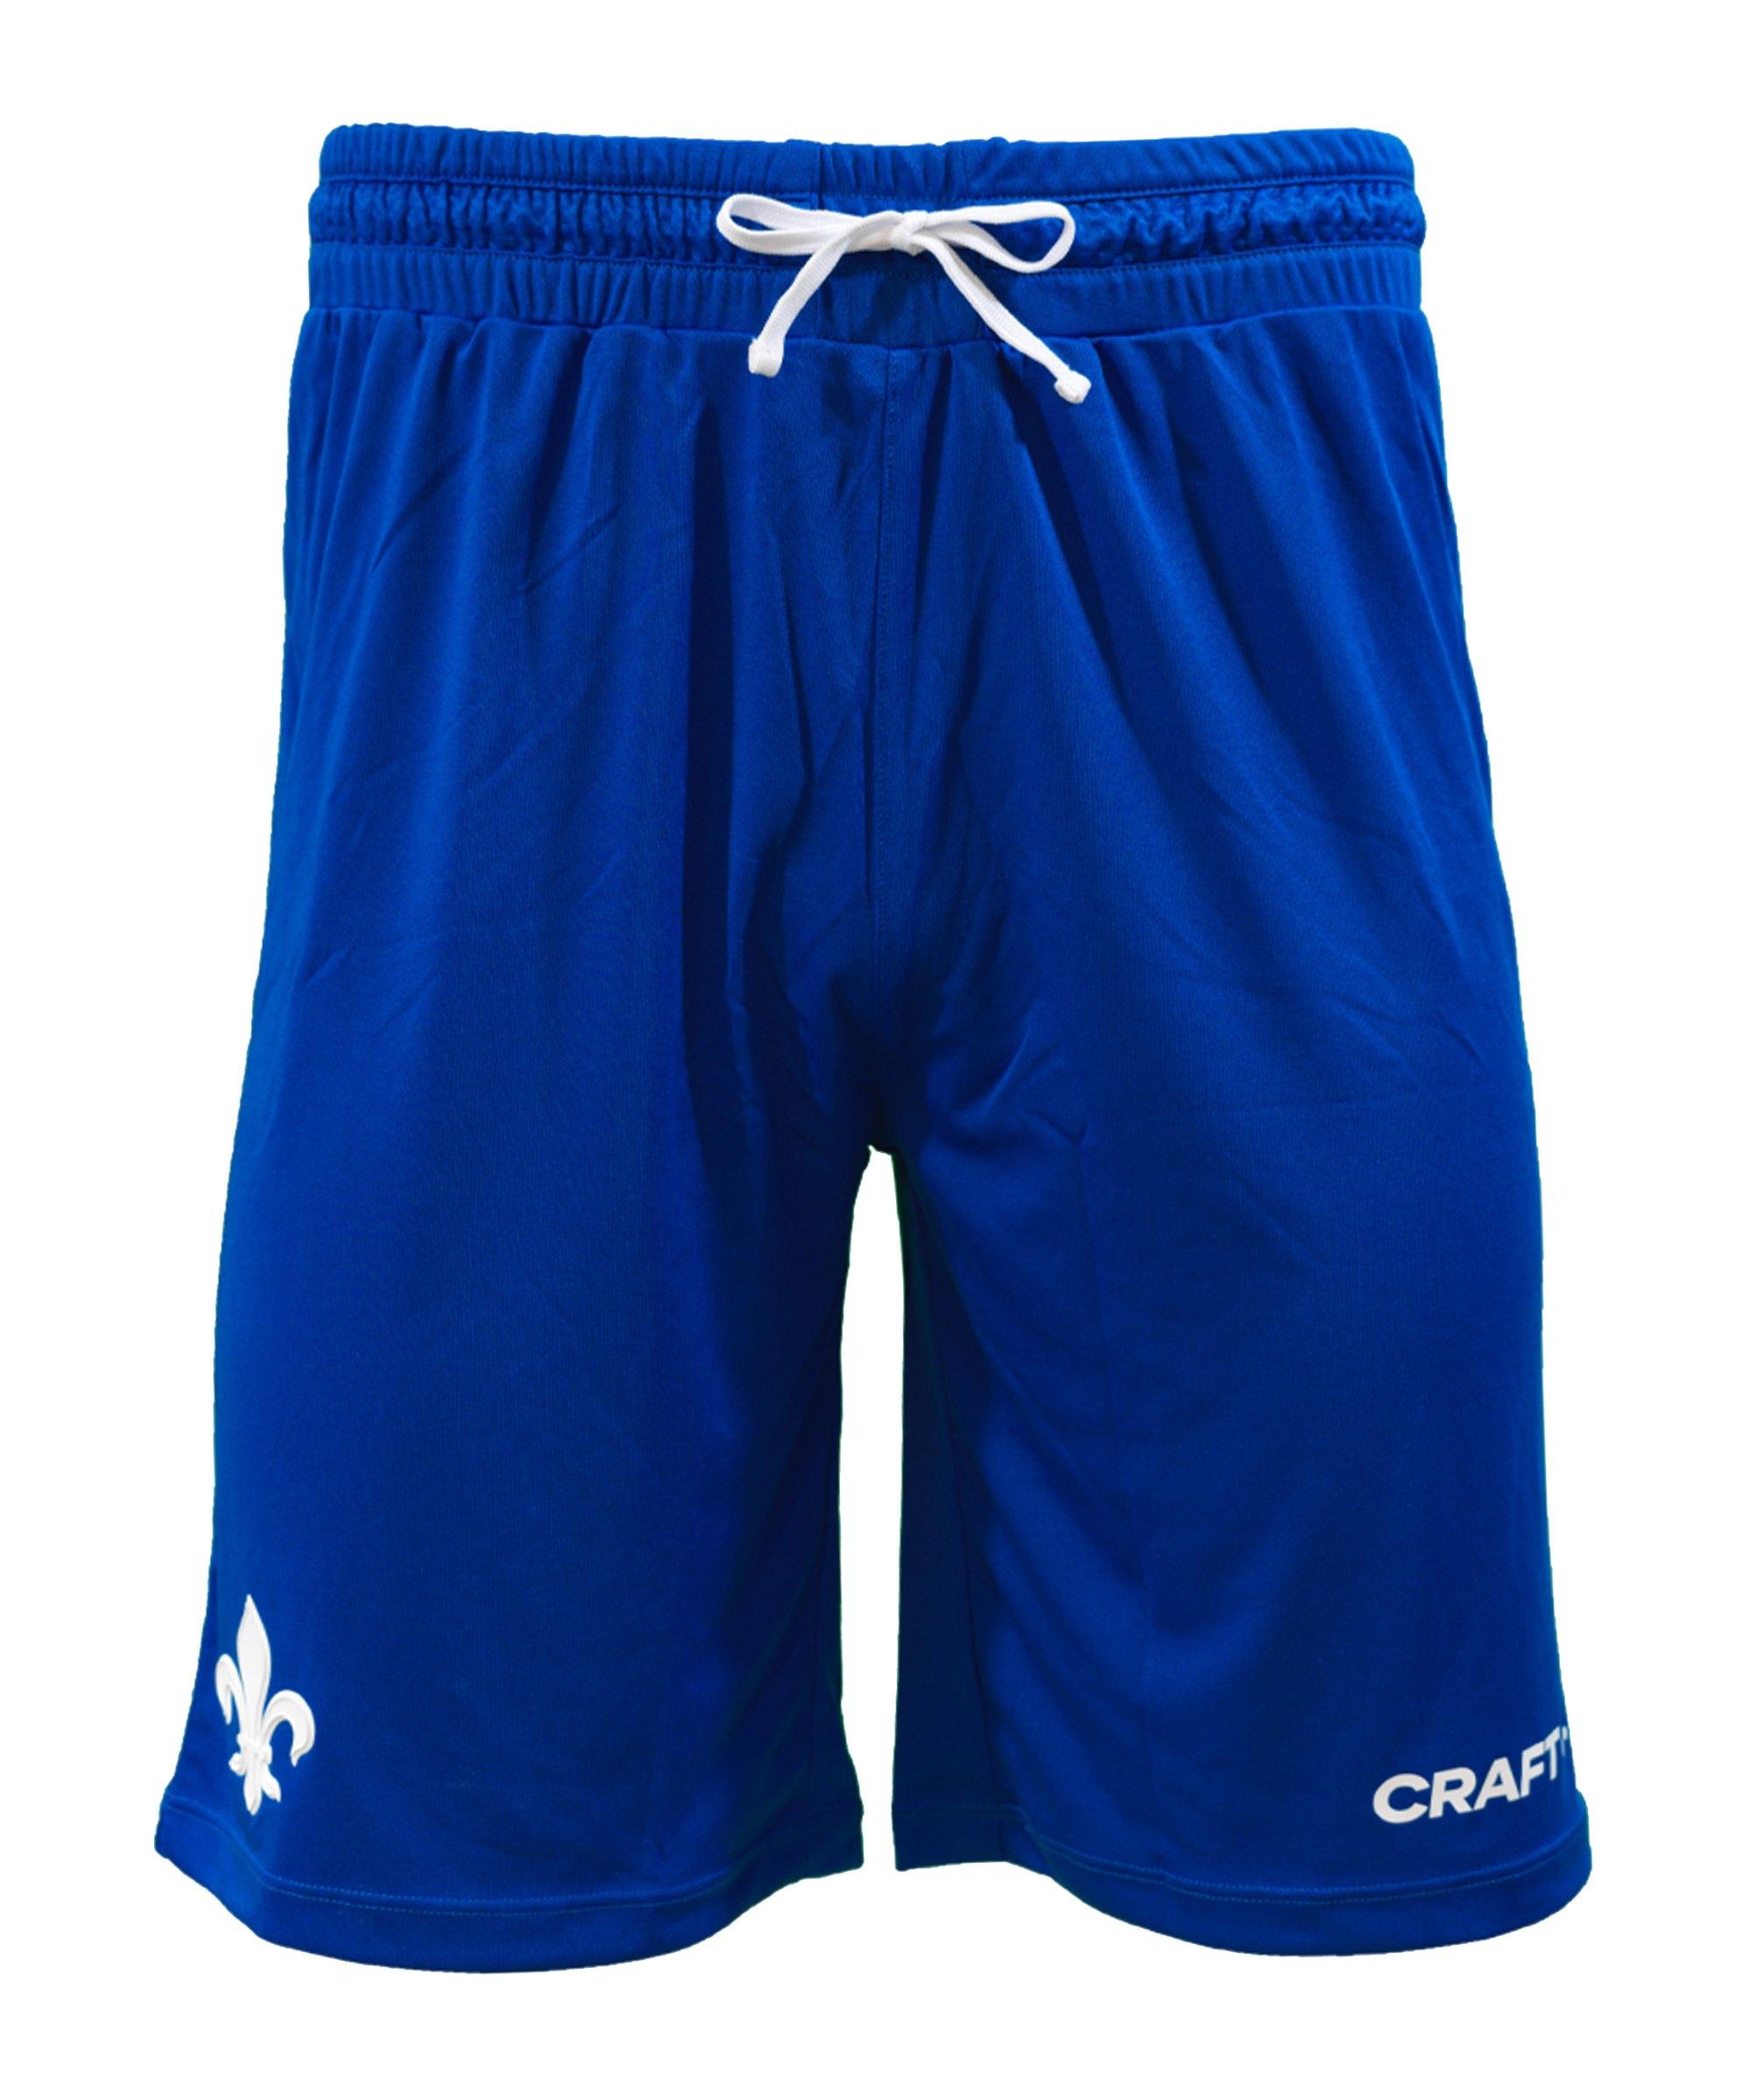 Craft SV Darmstadt 98 Short Home 2021/2022 Blau F36990 - blau